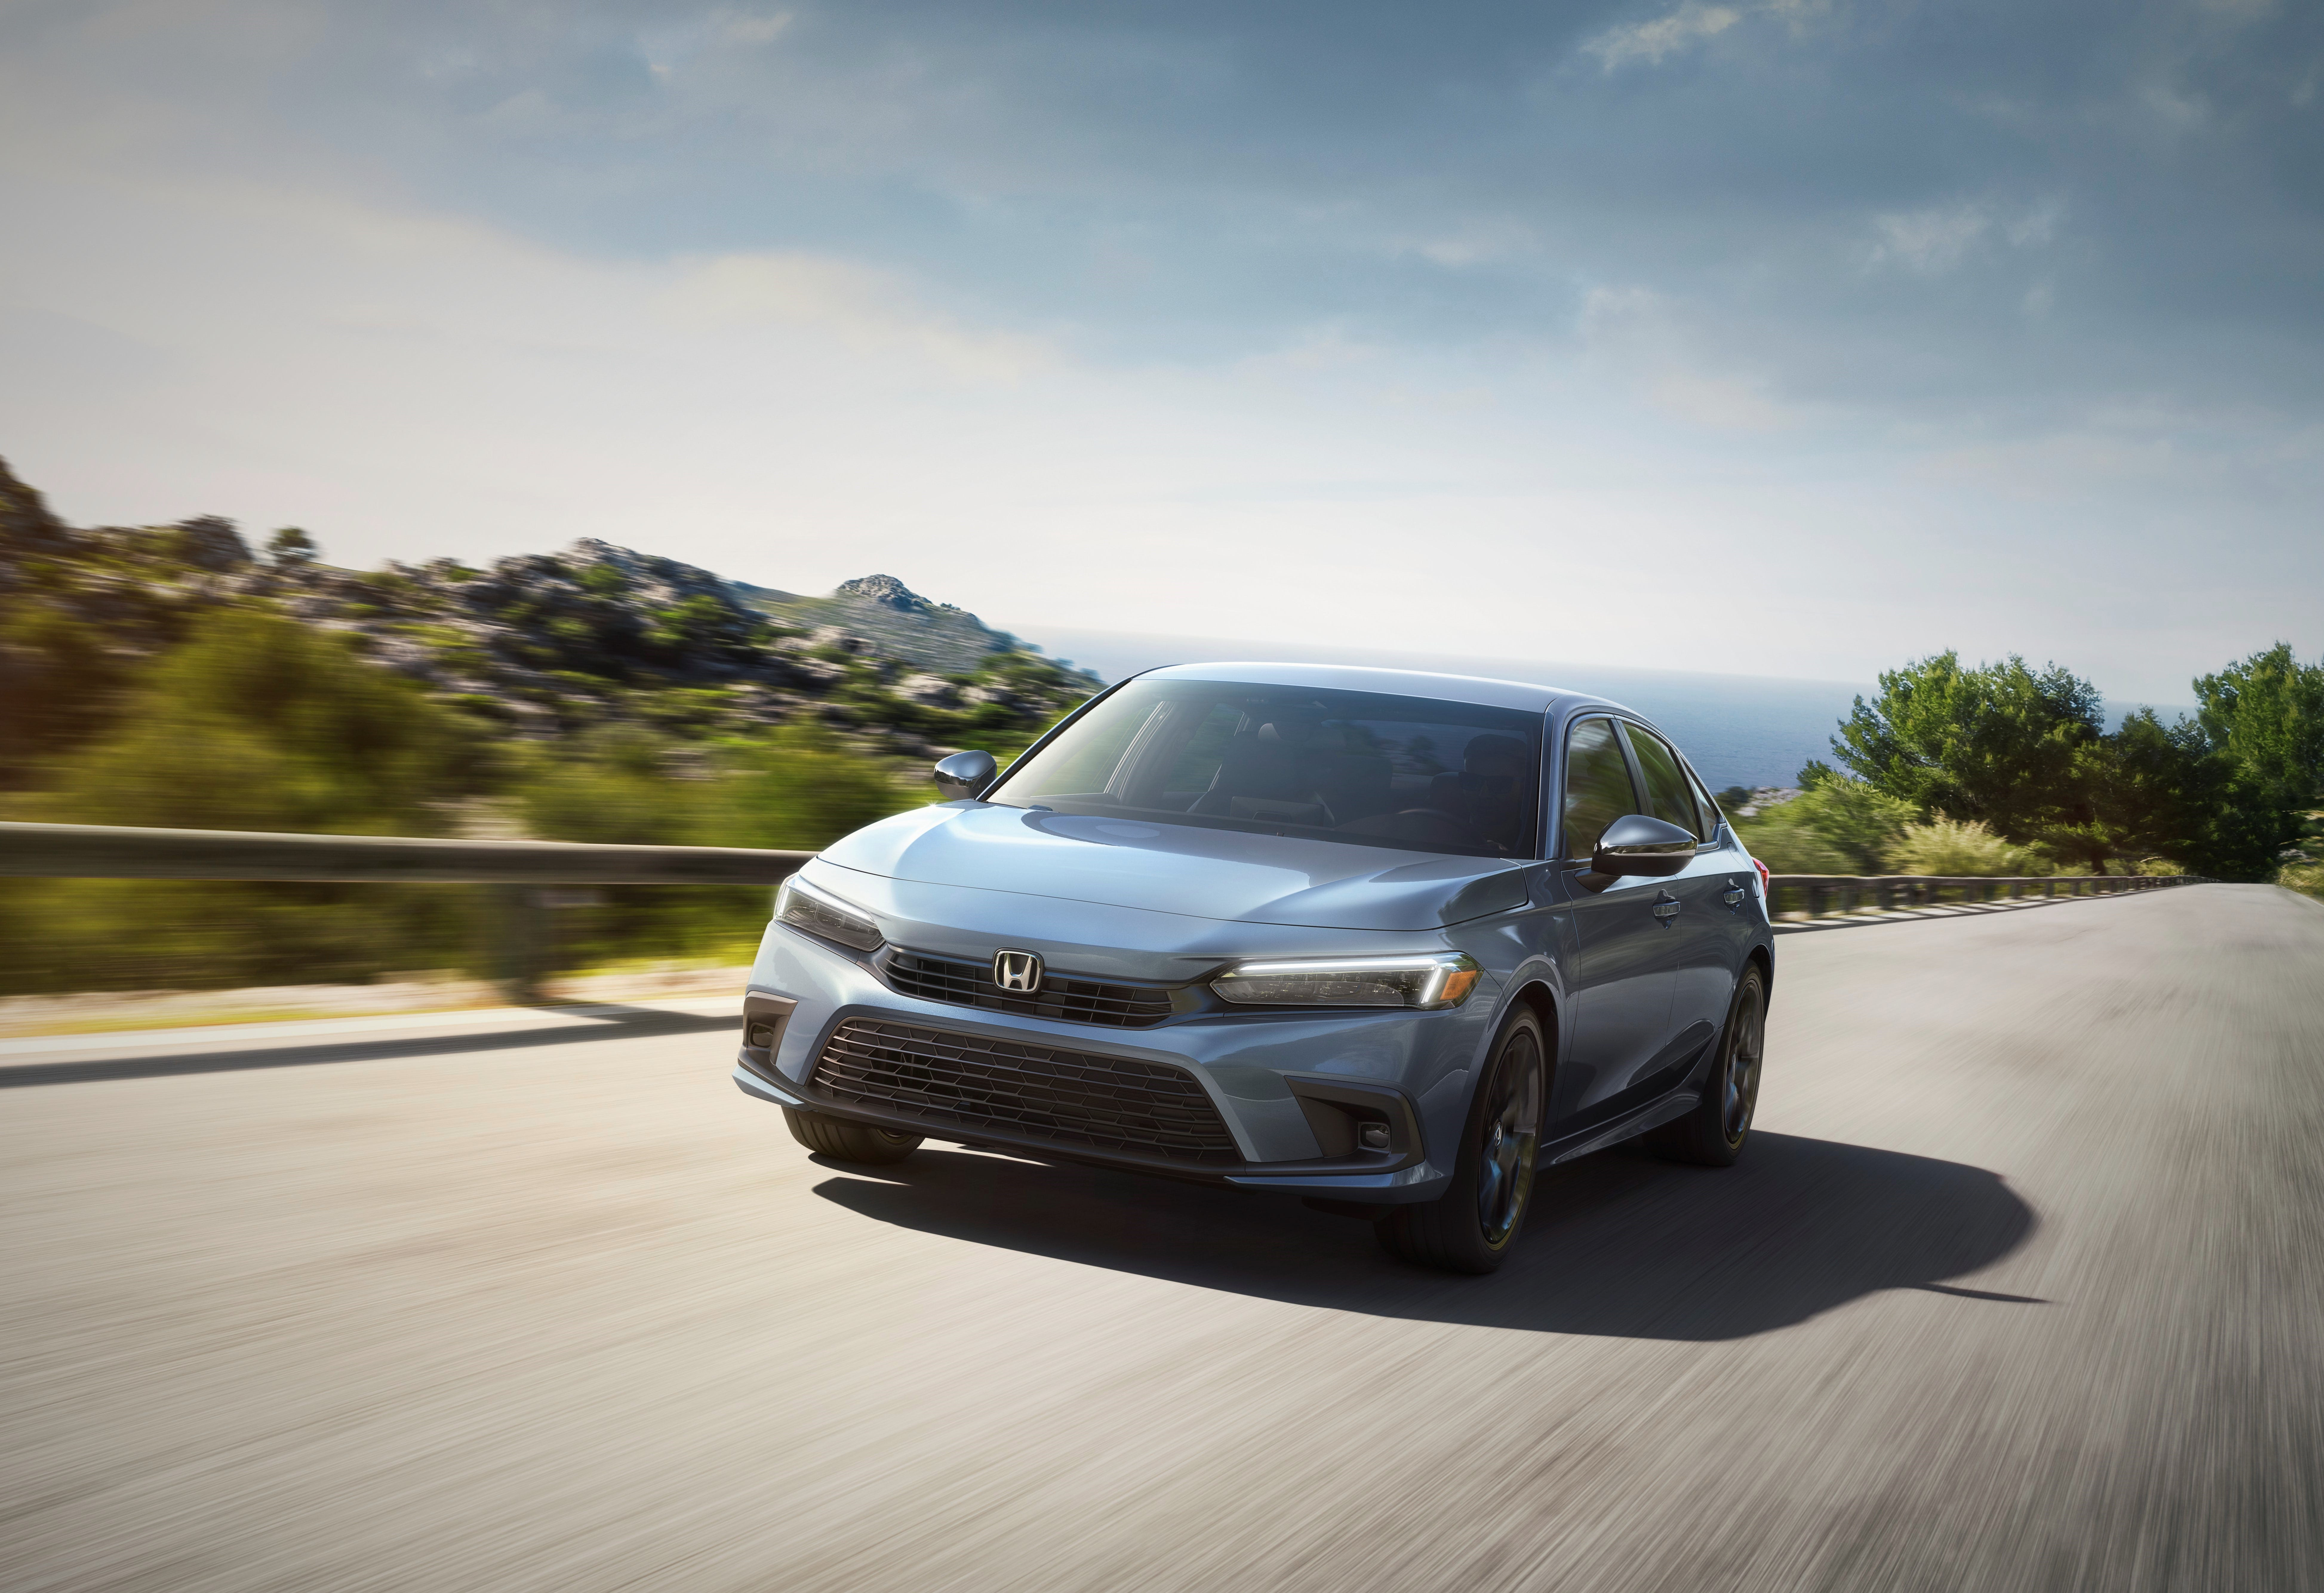 Honda reveals redesigned Civic: Compact car boasts improved fuel economy